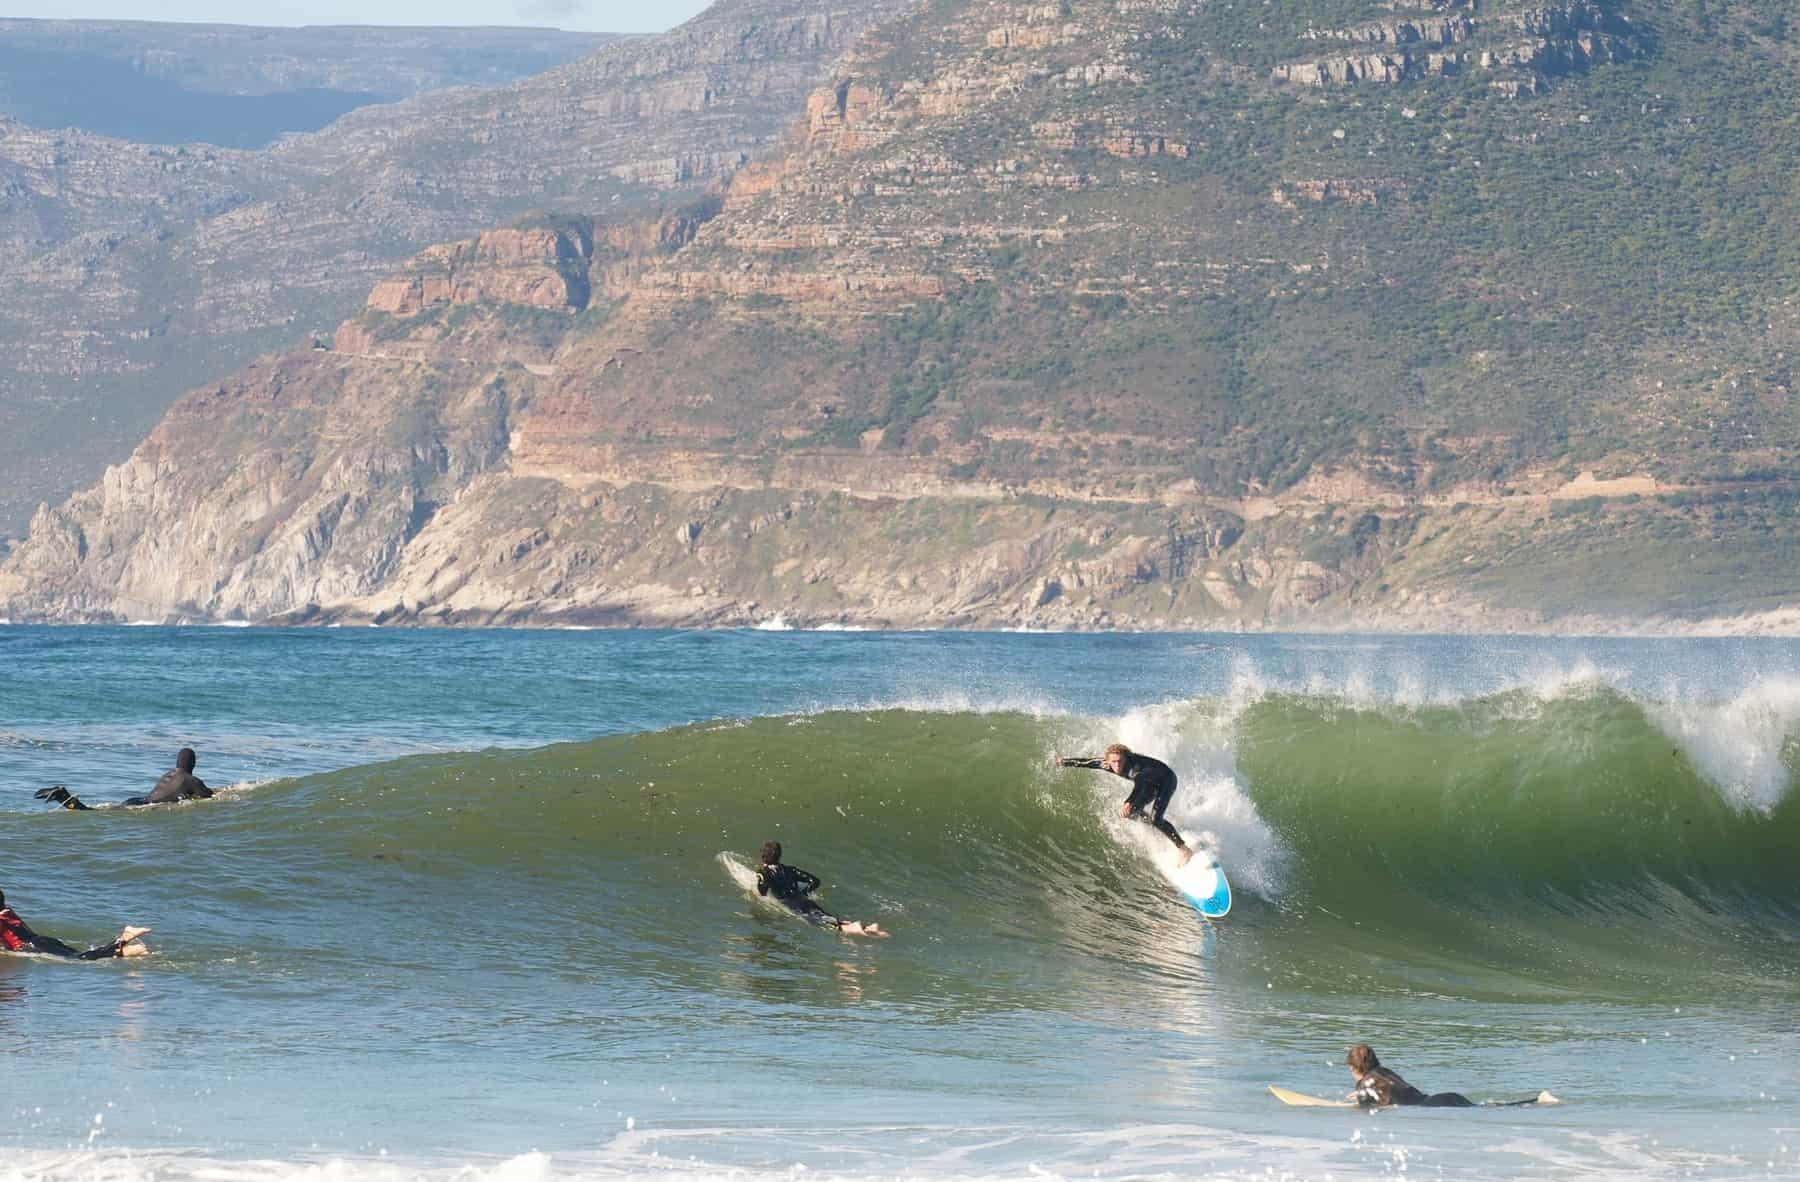 Surfer at popular surfing break,Long Beach, Kommetjie,Cape Town